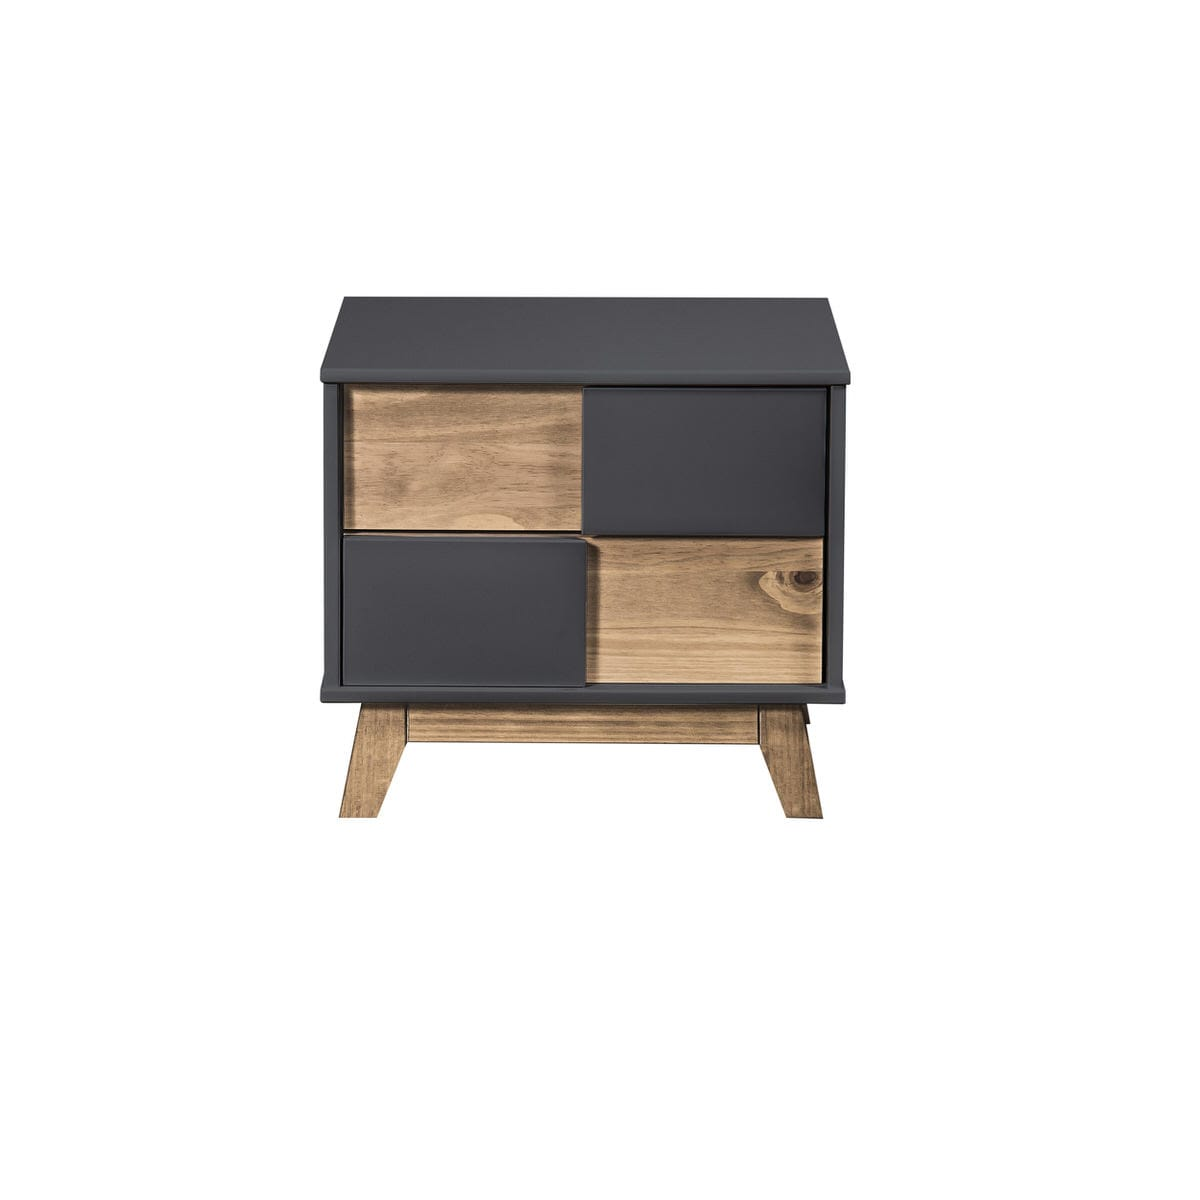 Mid Century Rustic Modern Livonia 2 Drawer Dark Grey Natural Wood Nightstand By Manhattan Comfort